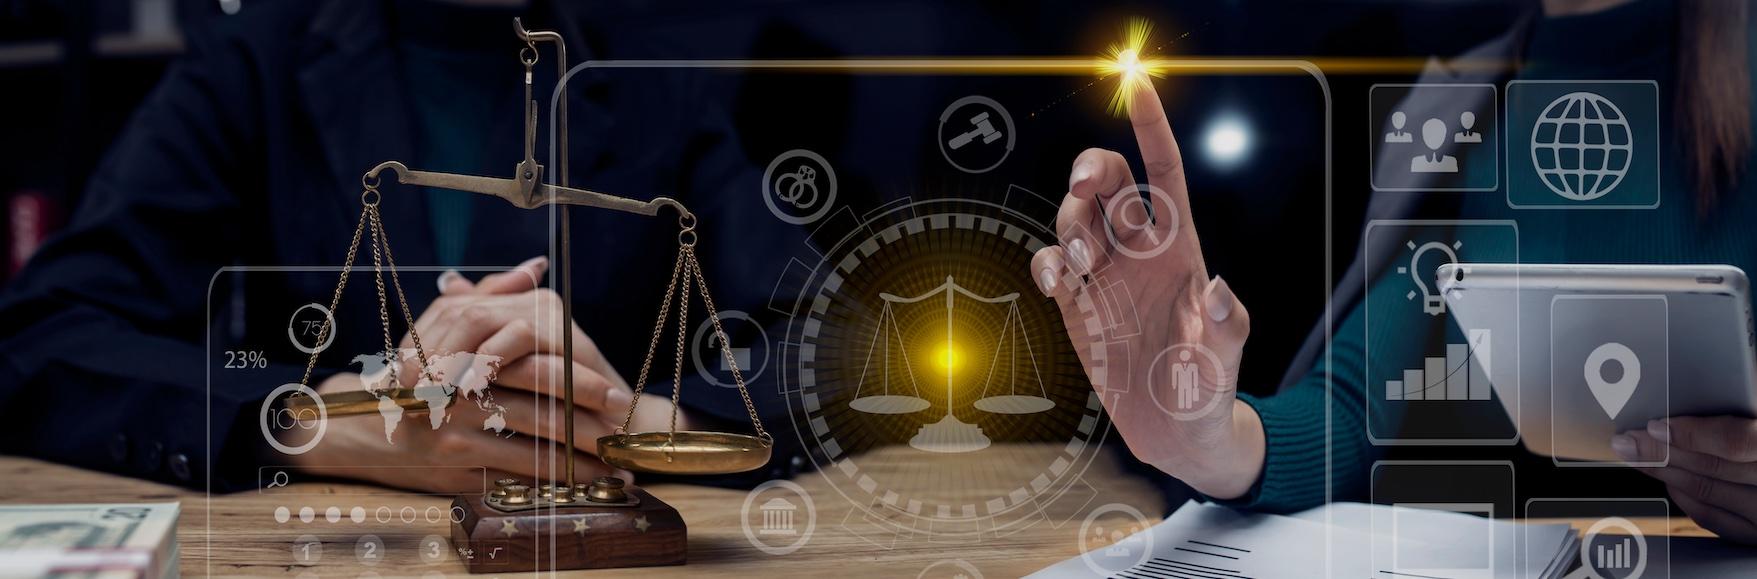 Age verification and legislation